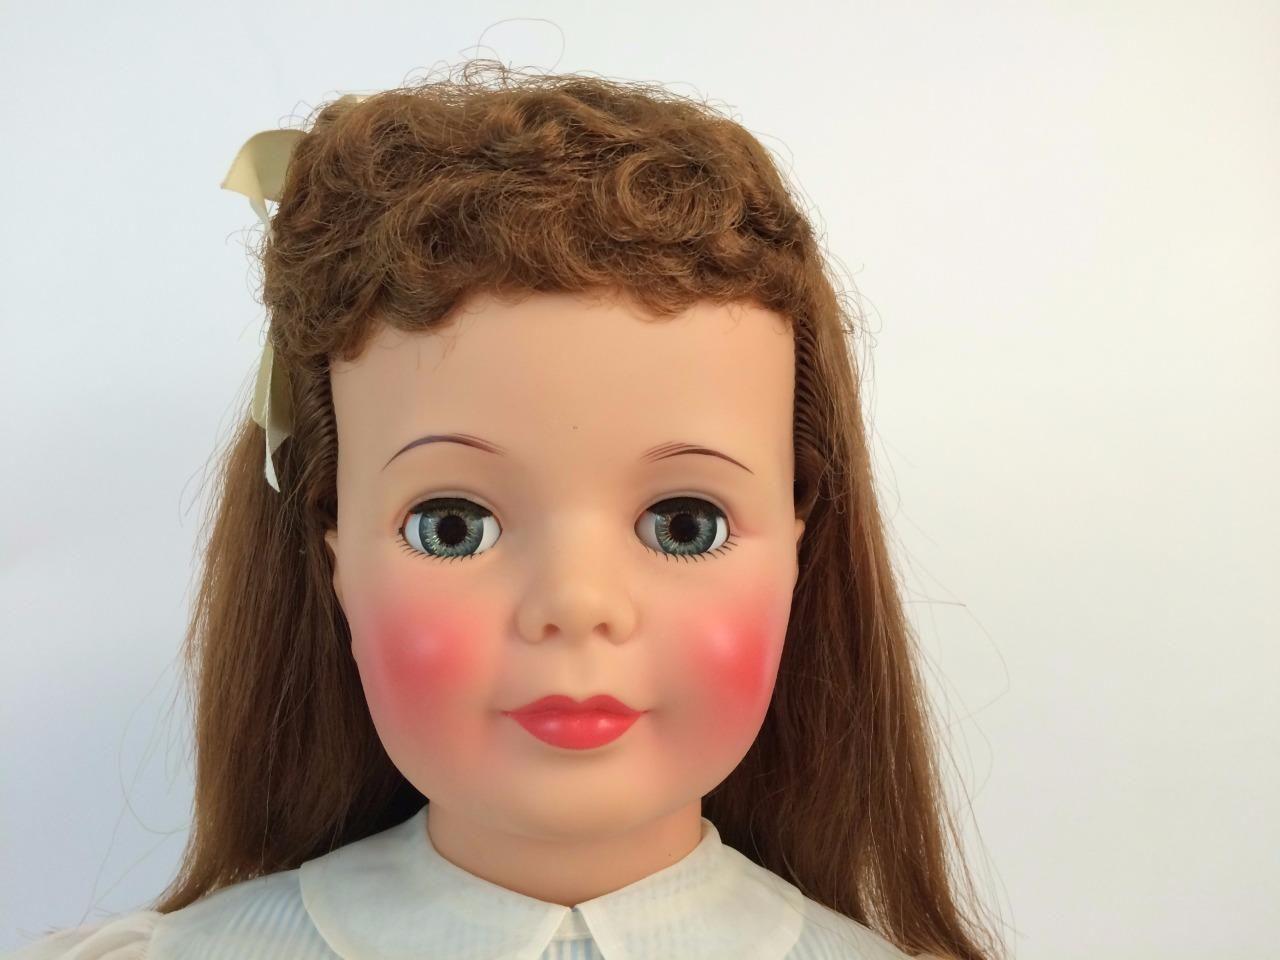 Patti Playpal Doll 1960 Companion Htf Curly Bang Auburn